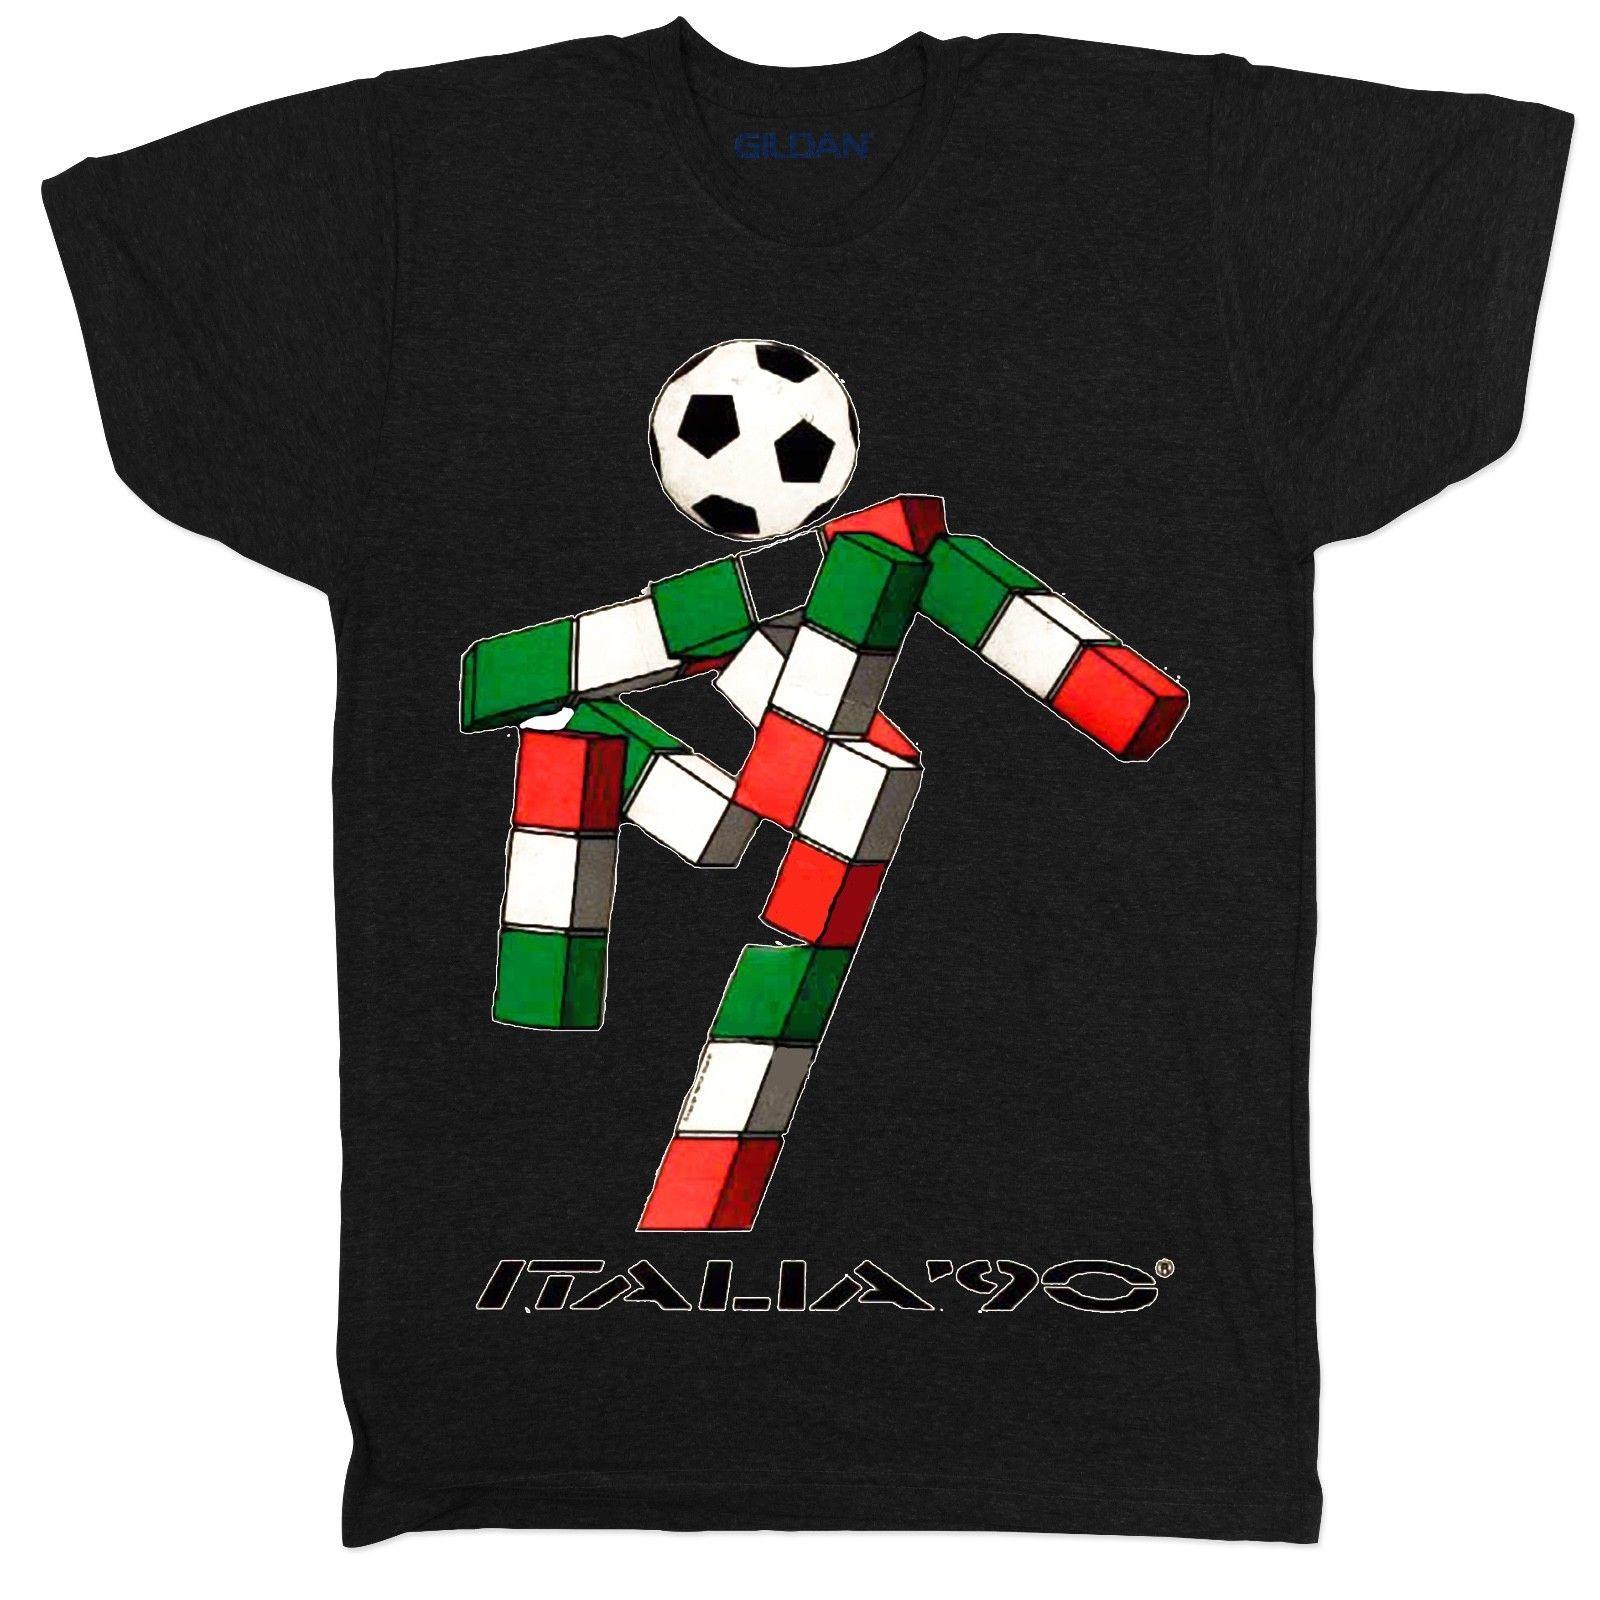 ITALIA 90 FOOTBALL WORLD CUP MASCOT ITALY TUMBLR SOCCER MENS RETRO BLACK T  SHIRT Cartoon T Shirt Men Unisex Create T Shirts Skull T Shirts From  Cls6688520 6acfc0567